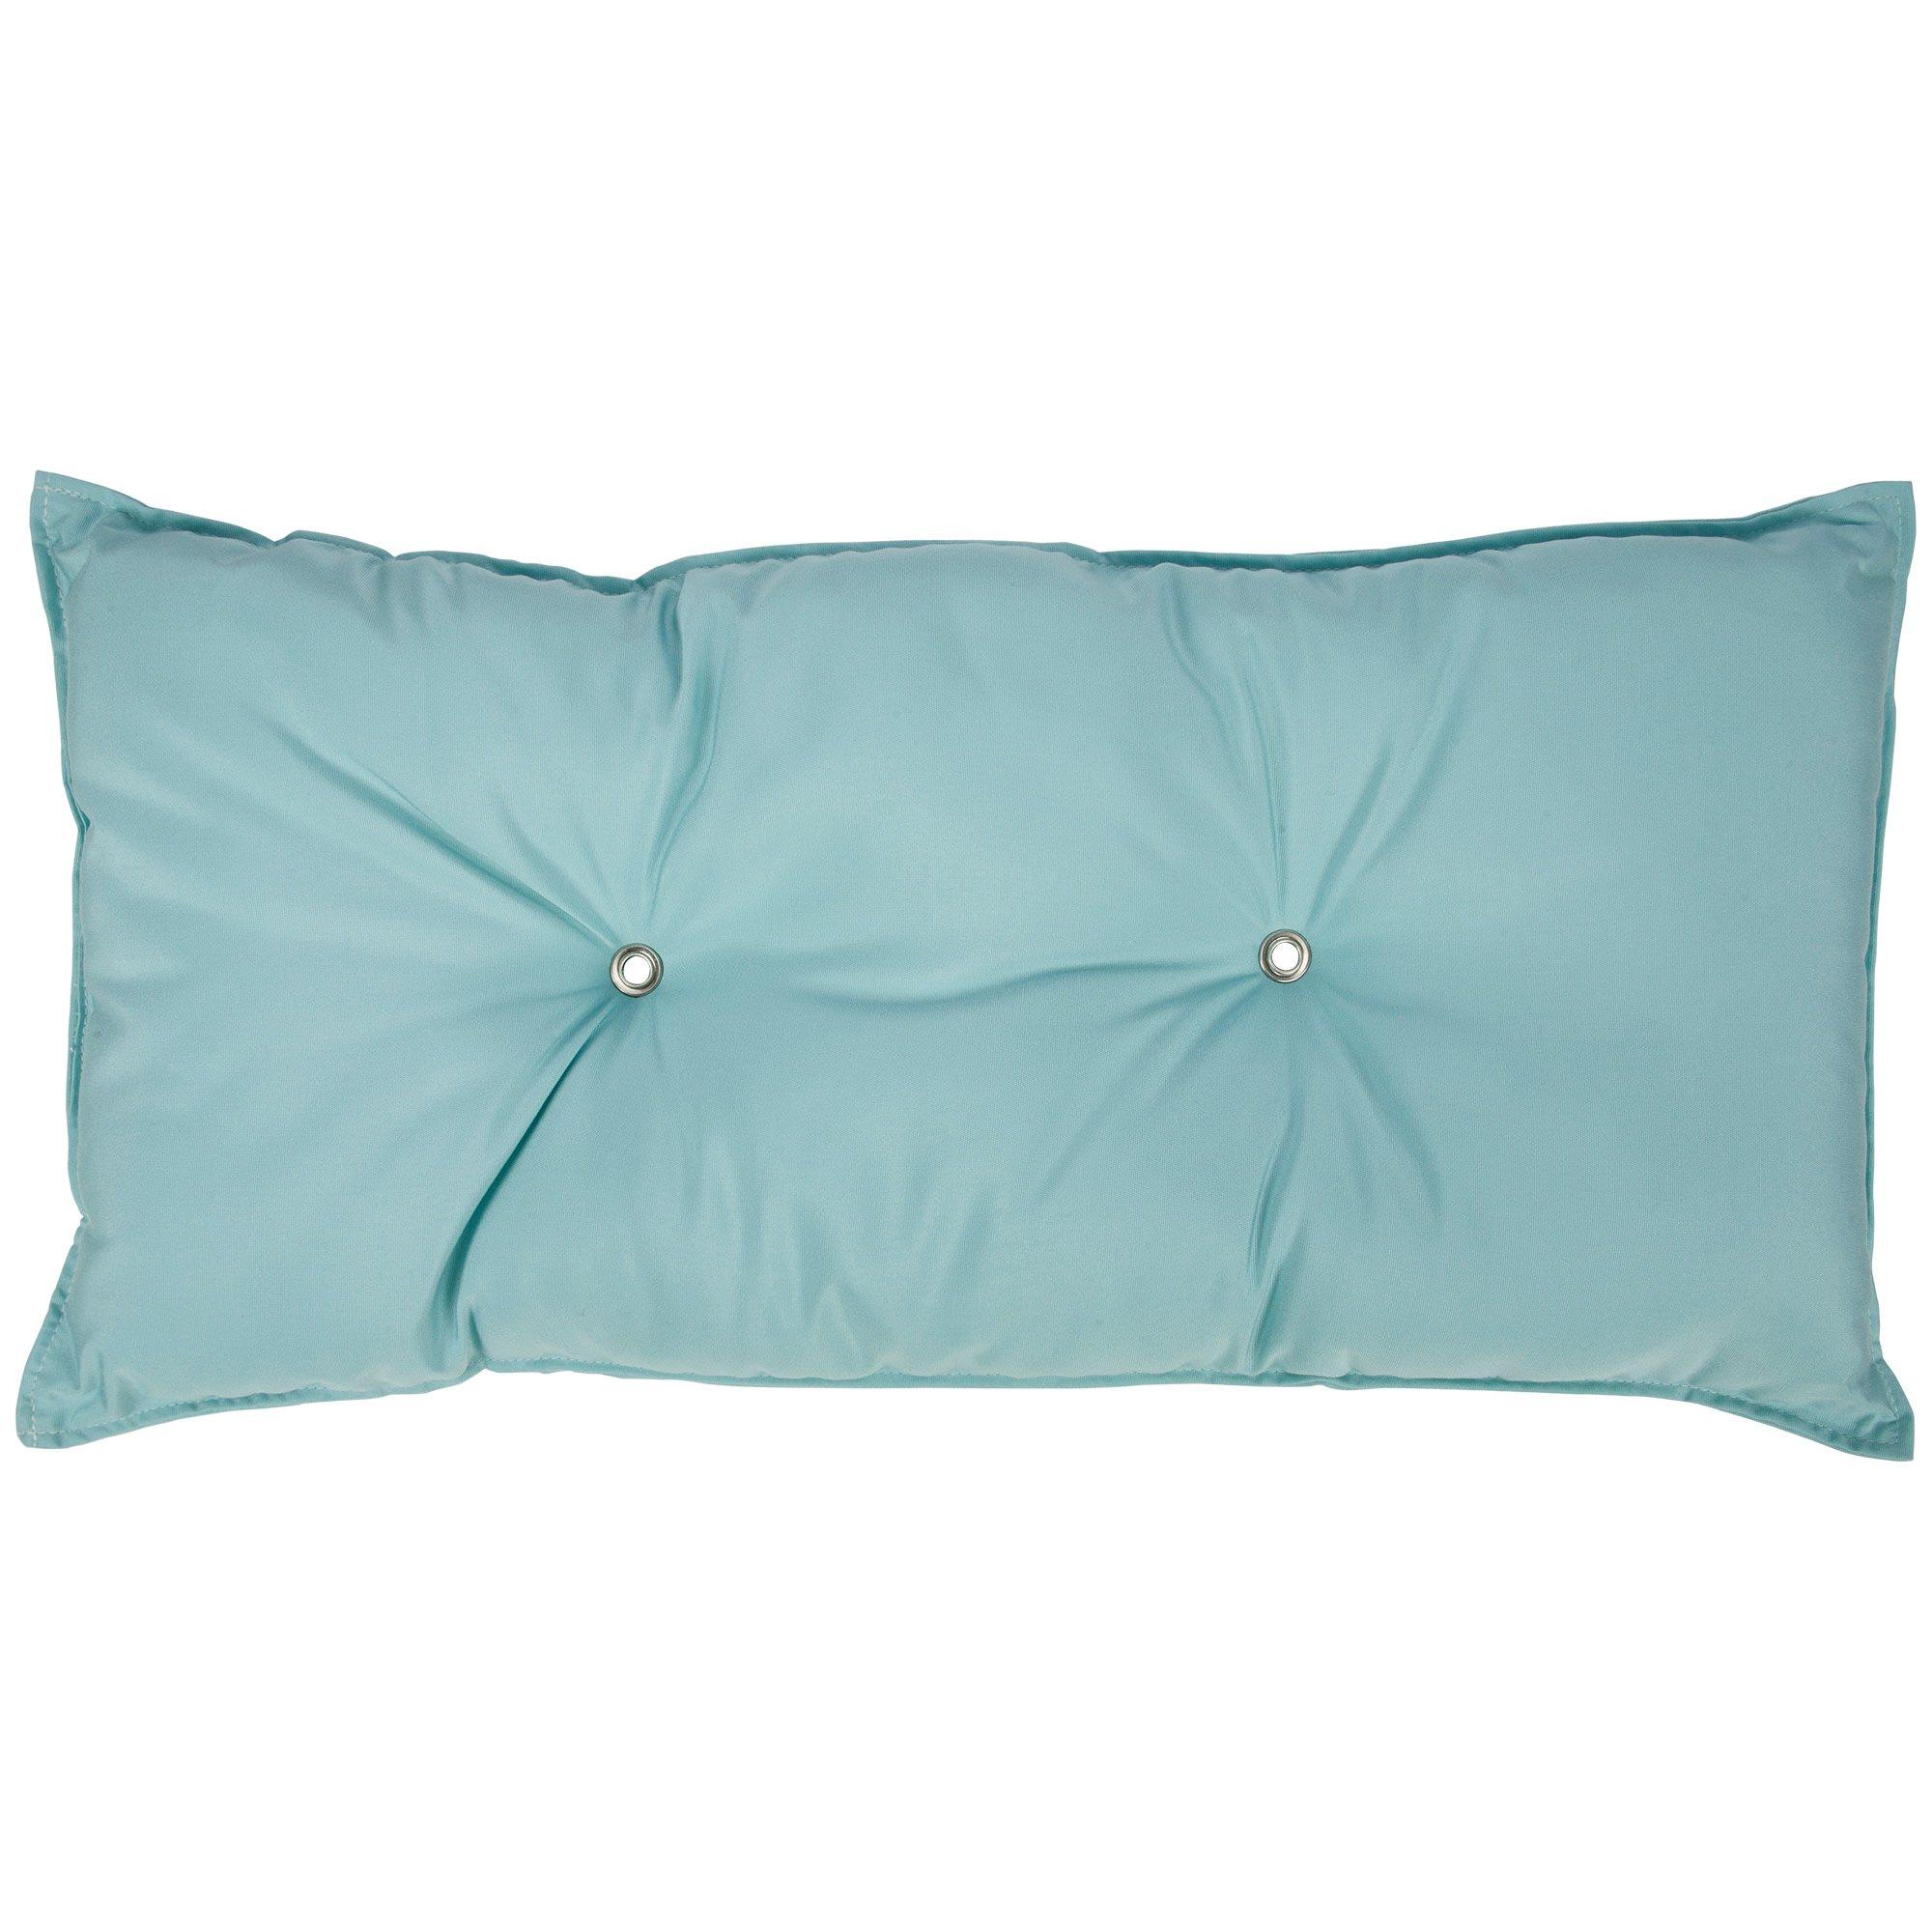 Tufted Hammock Pillow